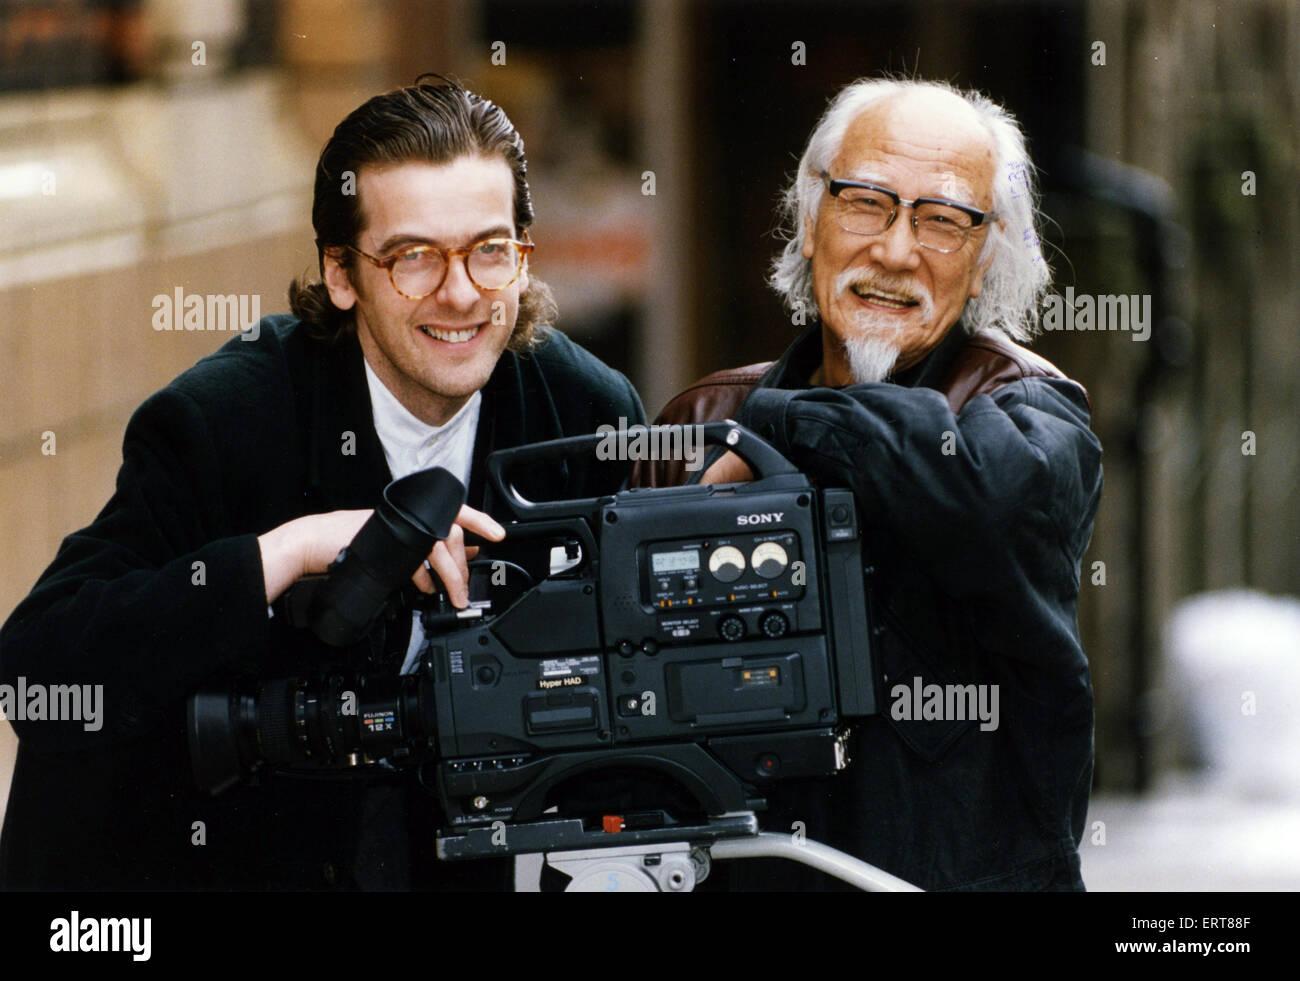 Actor Peter Capaldi  with japanese veteran film maker Suzuki Seijun at Glasgow's prestigious Glasgow Film Theatre - Stock Image